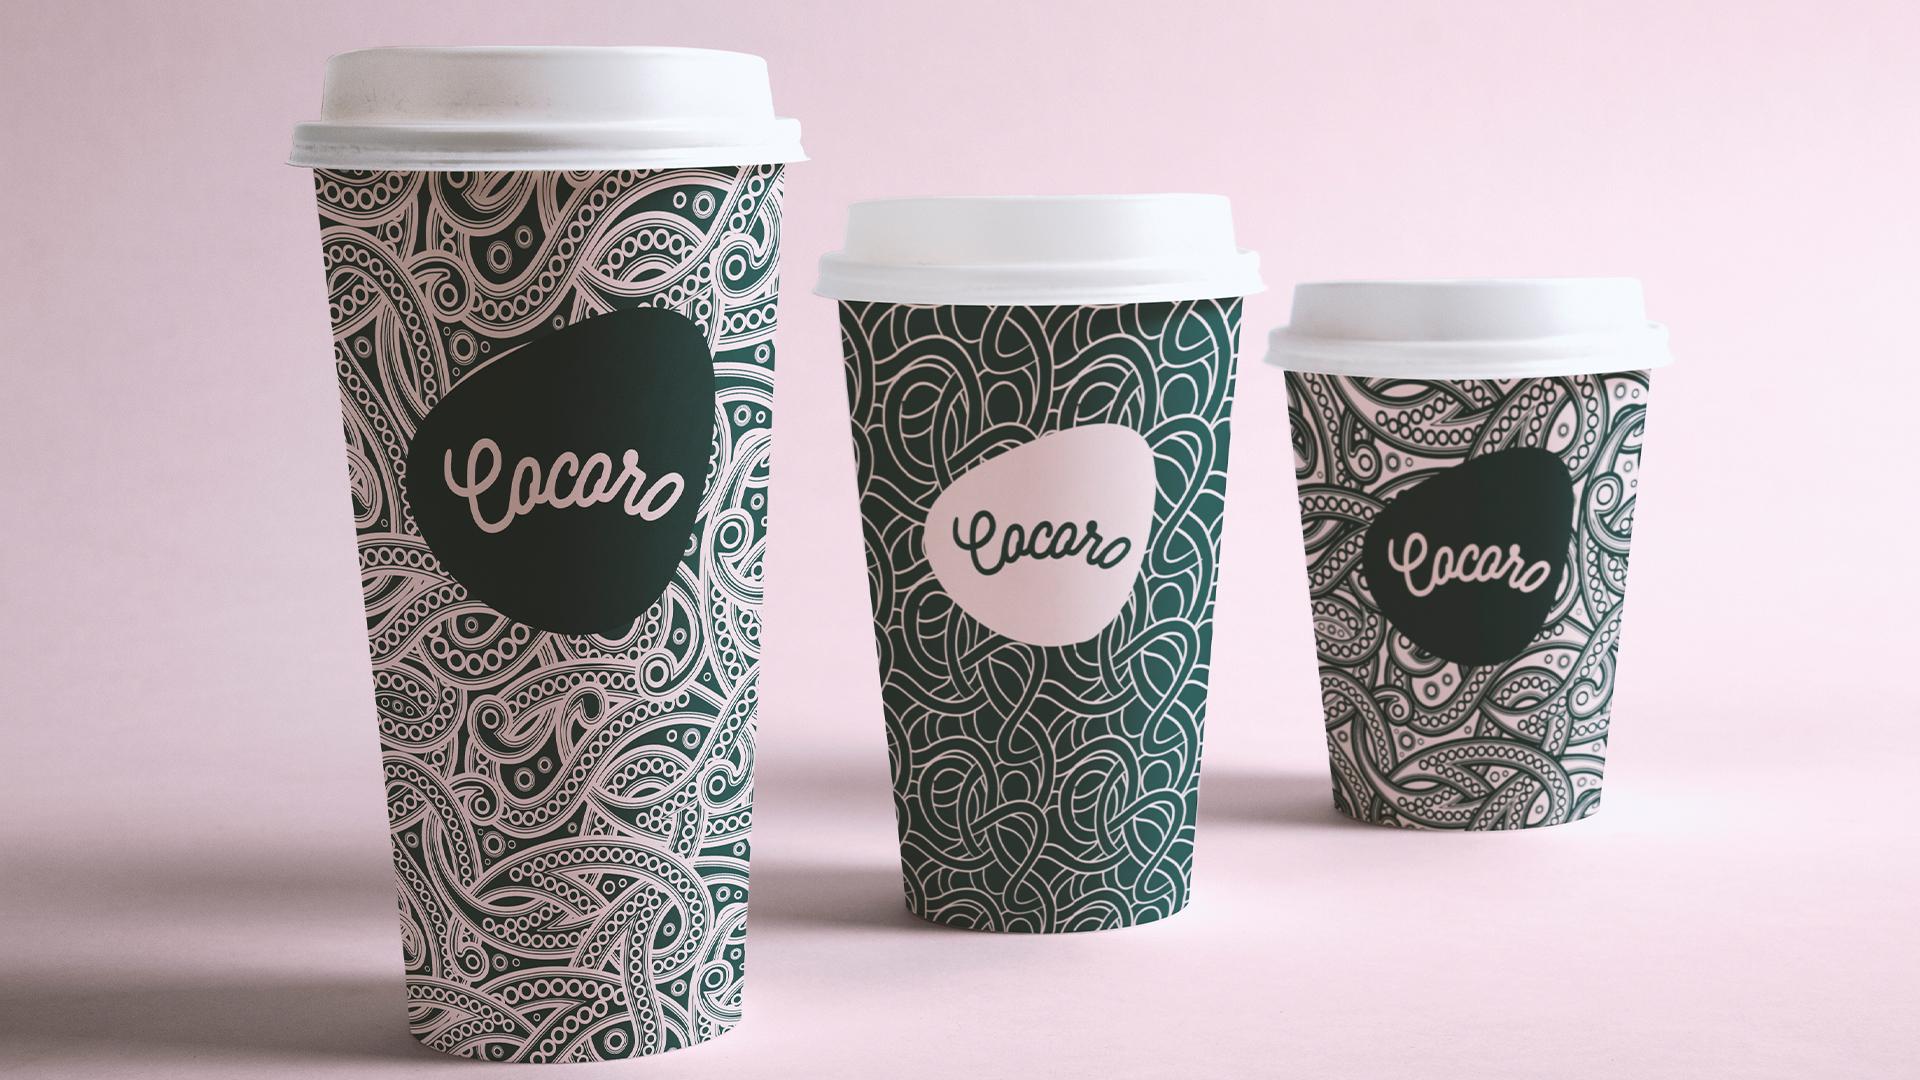 cocoro咖啡厅品牌包装设计-咖啡杯设计